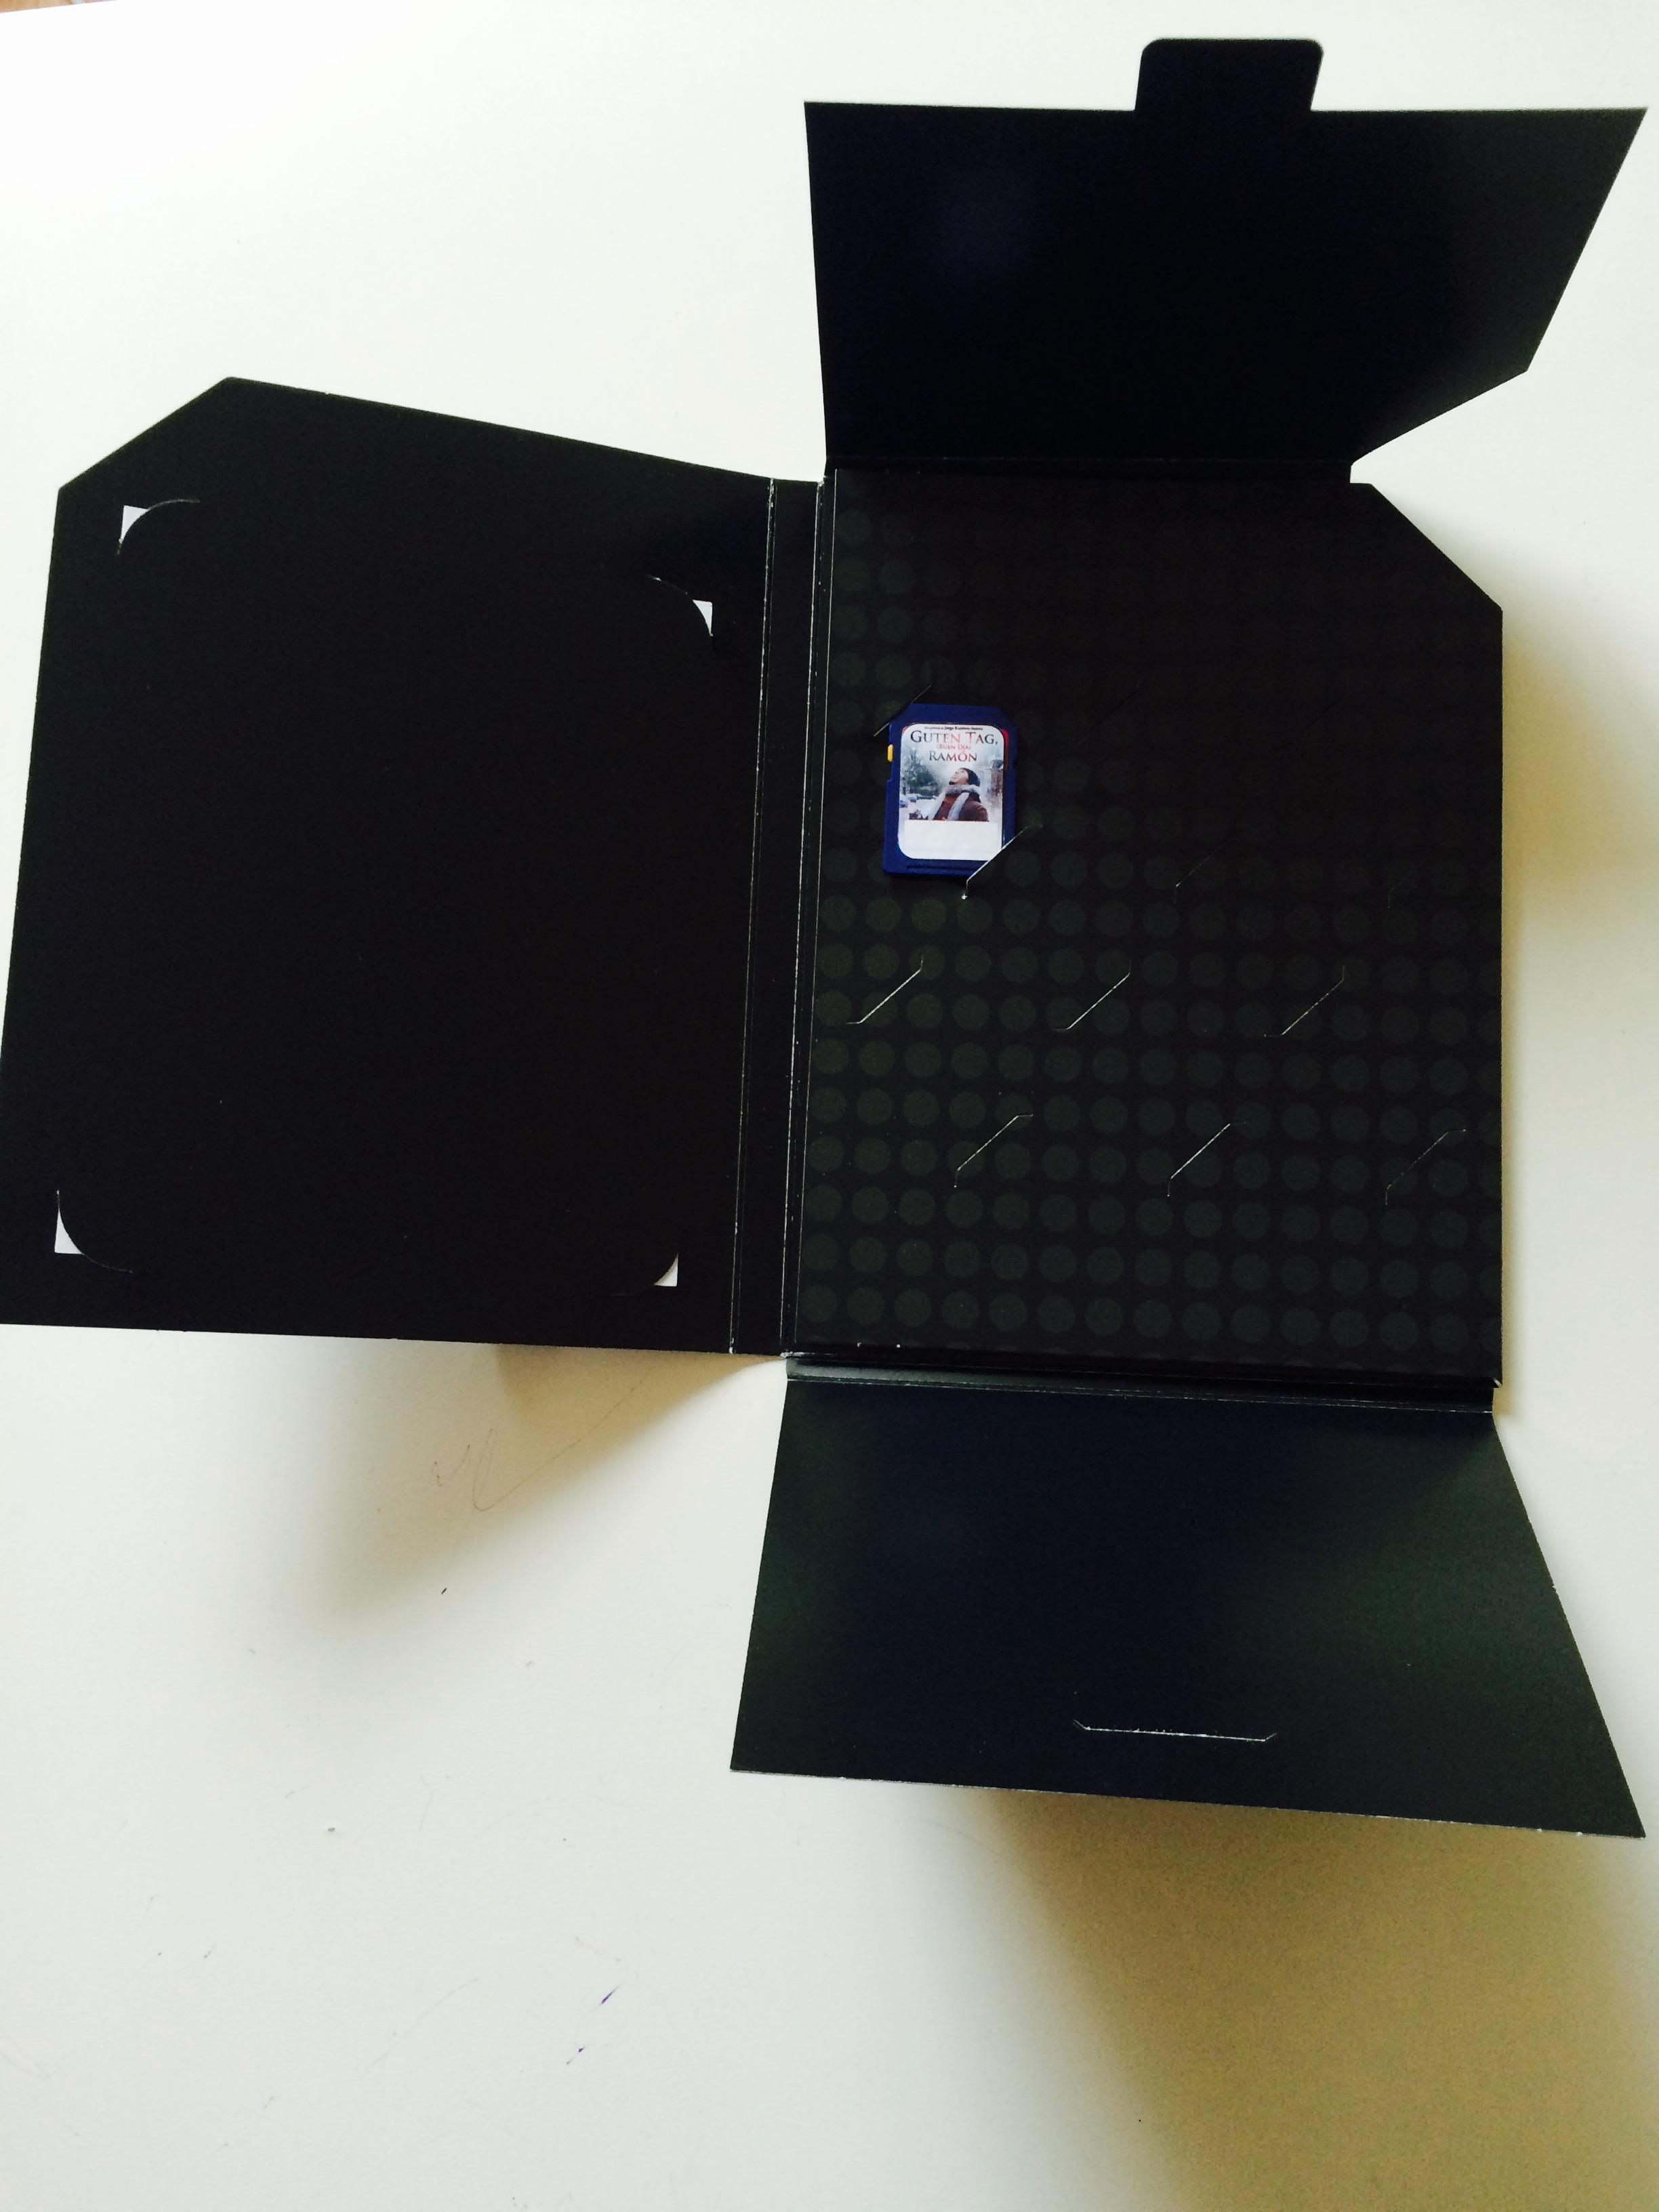 SucoProductions junket Press Materials Display 2.jpg